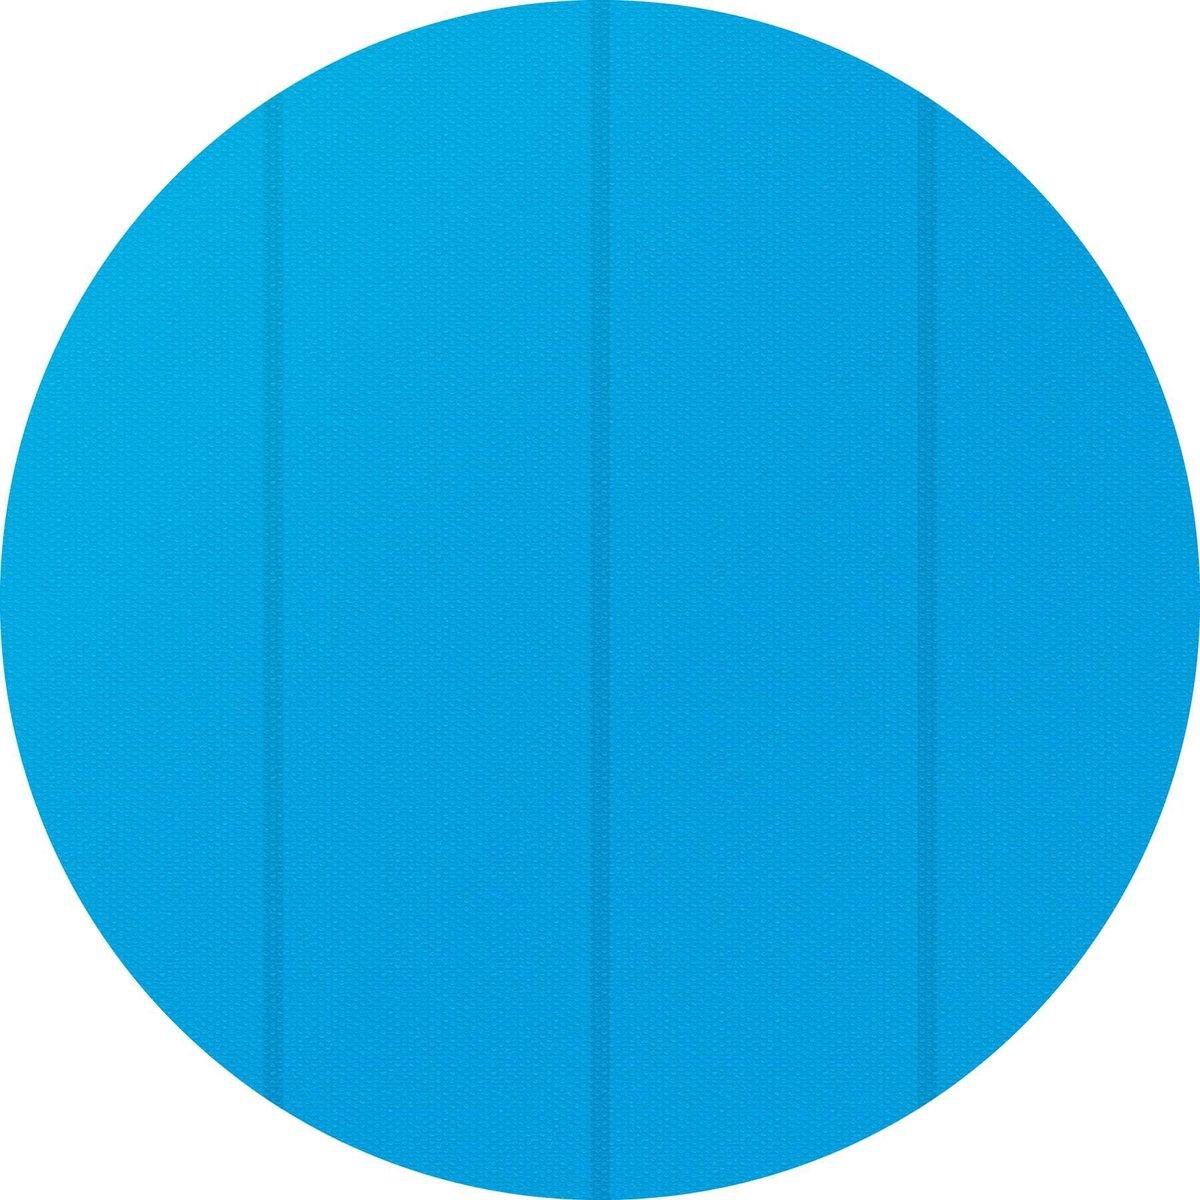 tectake - Zwembadafdekking zonnefolie rond Ø 549 cm - 403111